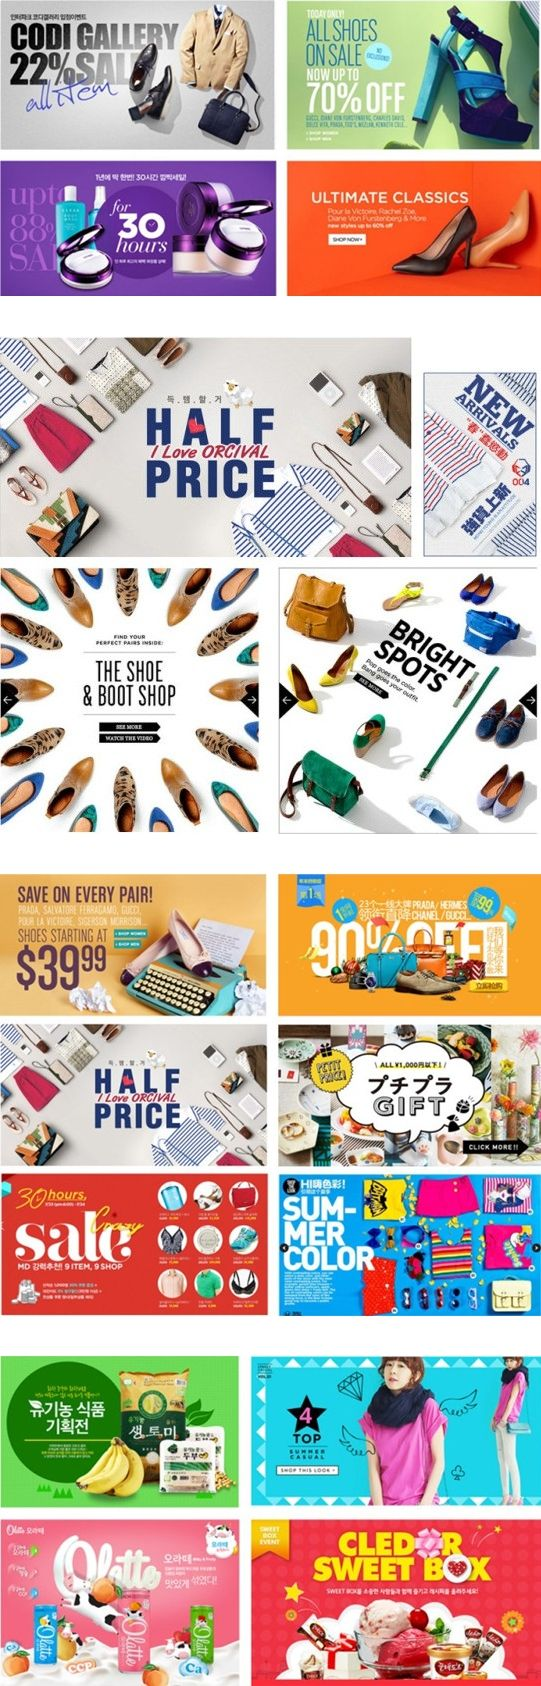 酷友观点/经验:电商banner图设计之商品该怎么玩?http://www.zcool.com.cn/article/ZMTUwOTY0.html